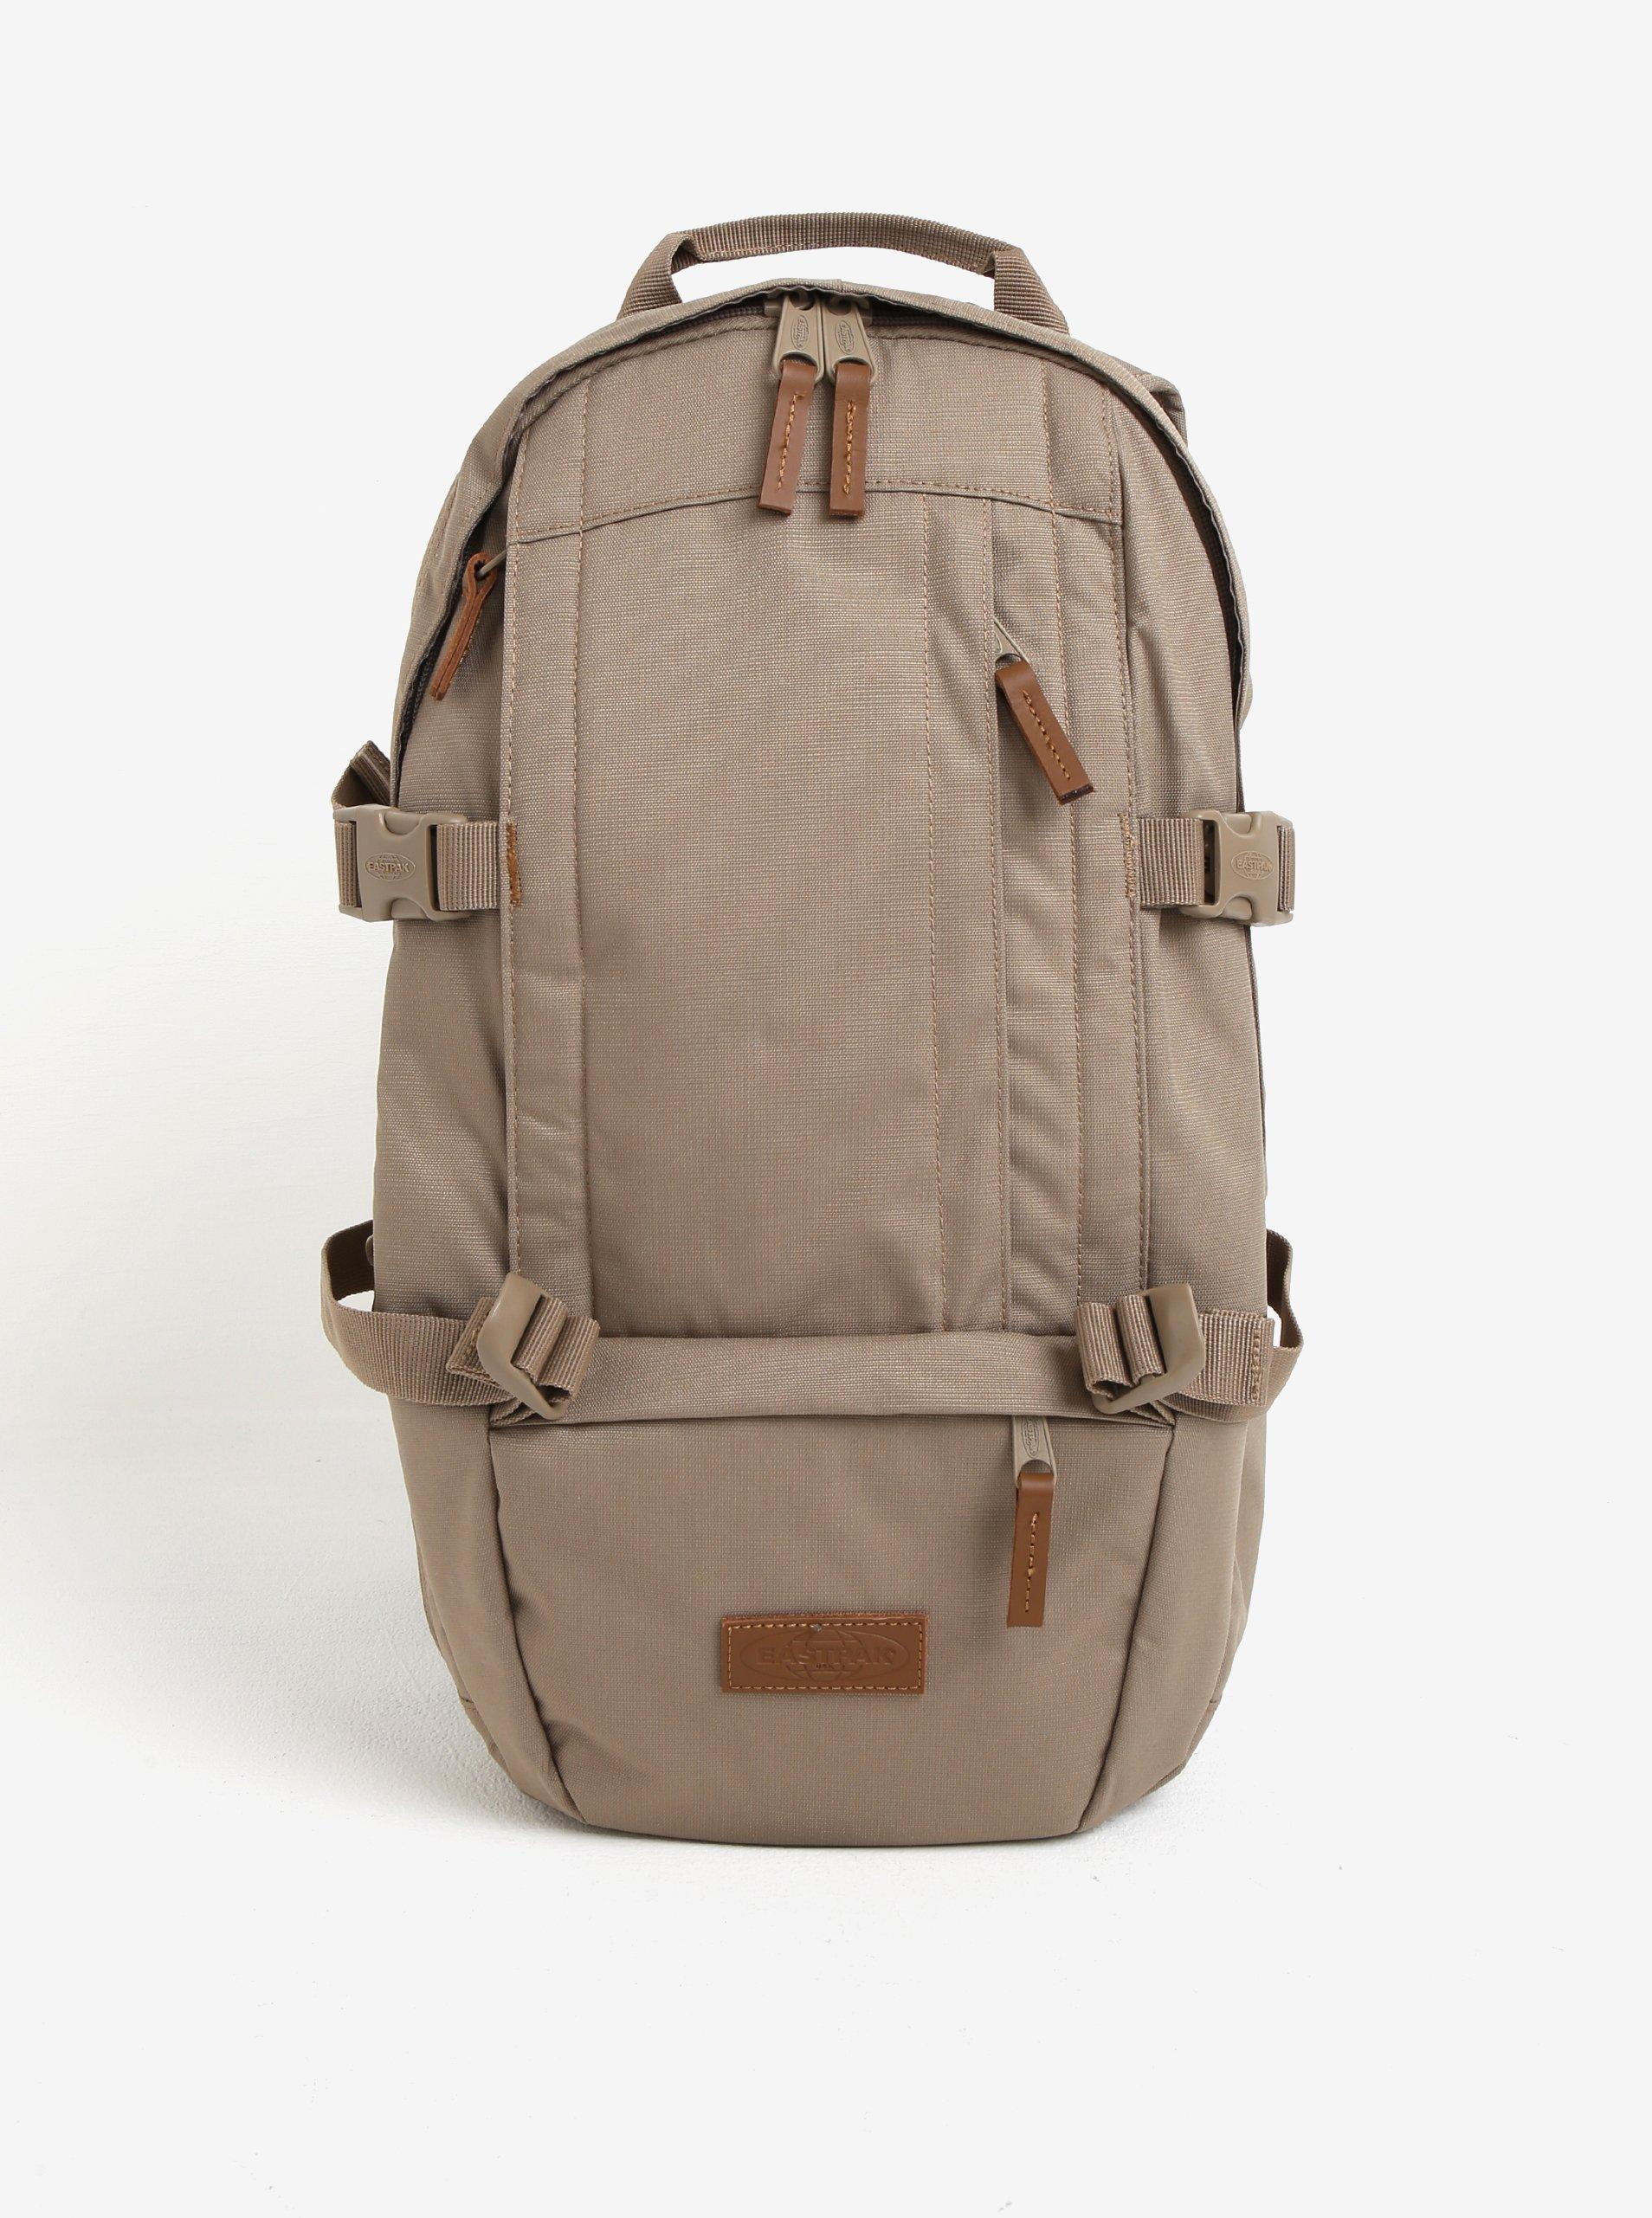 Béžový pánsky batoh Eastpak Floid 16 l